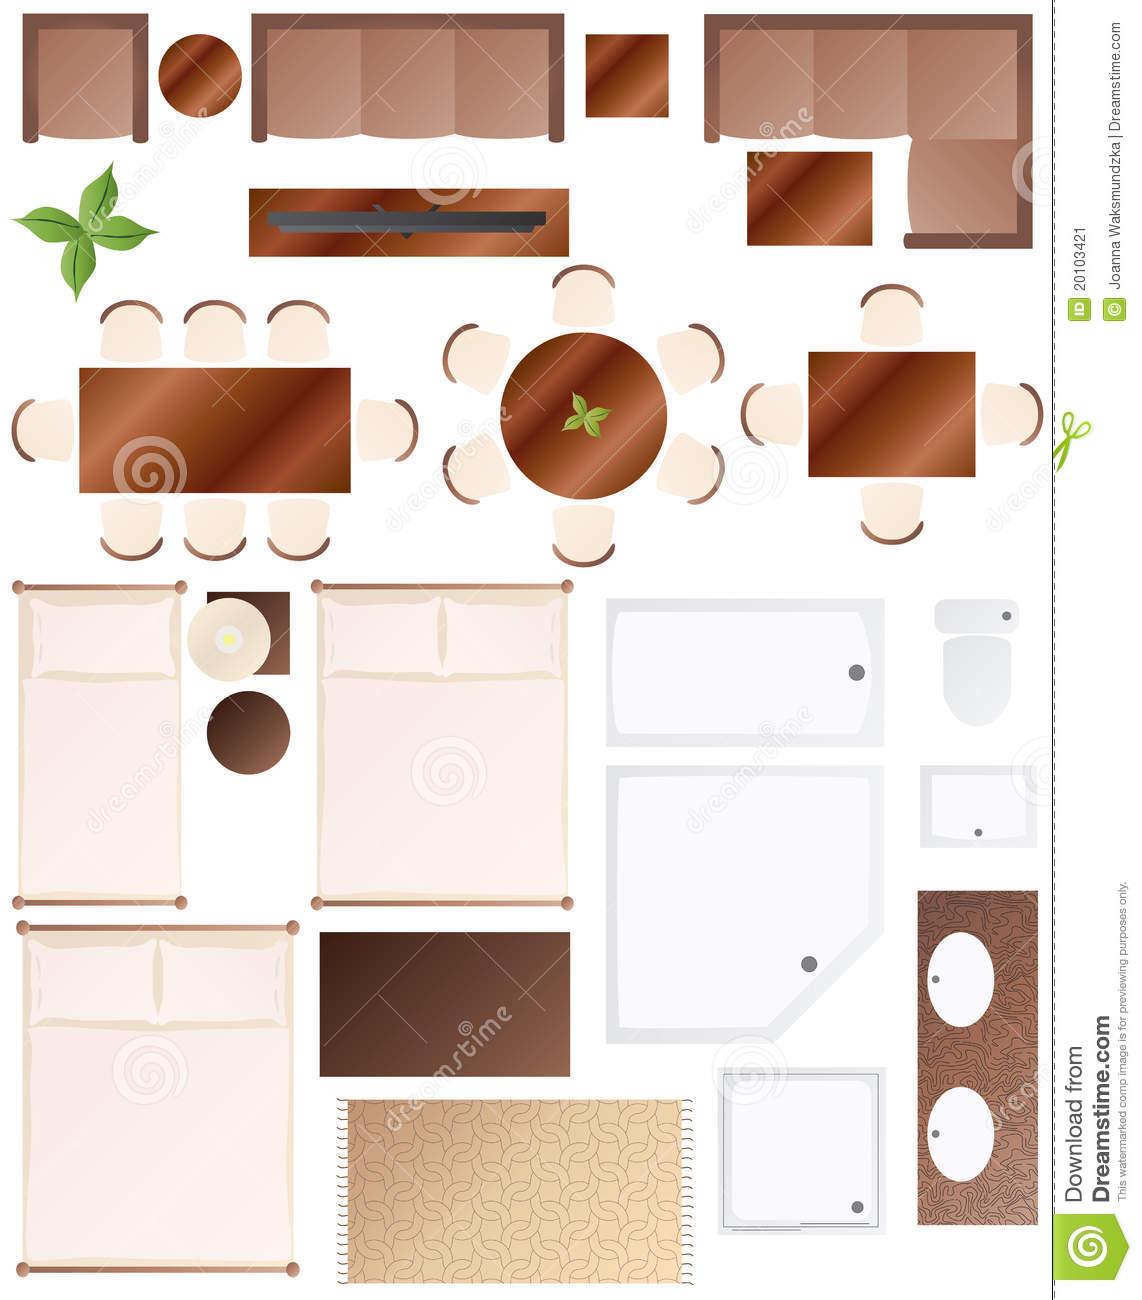 Floorplan clipart #5